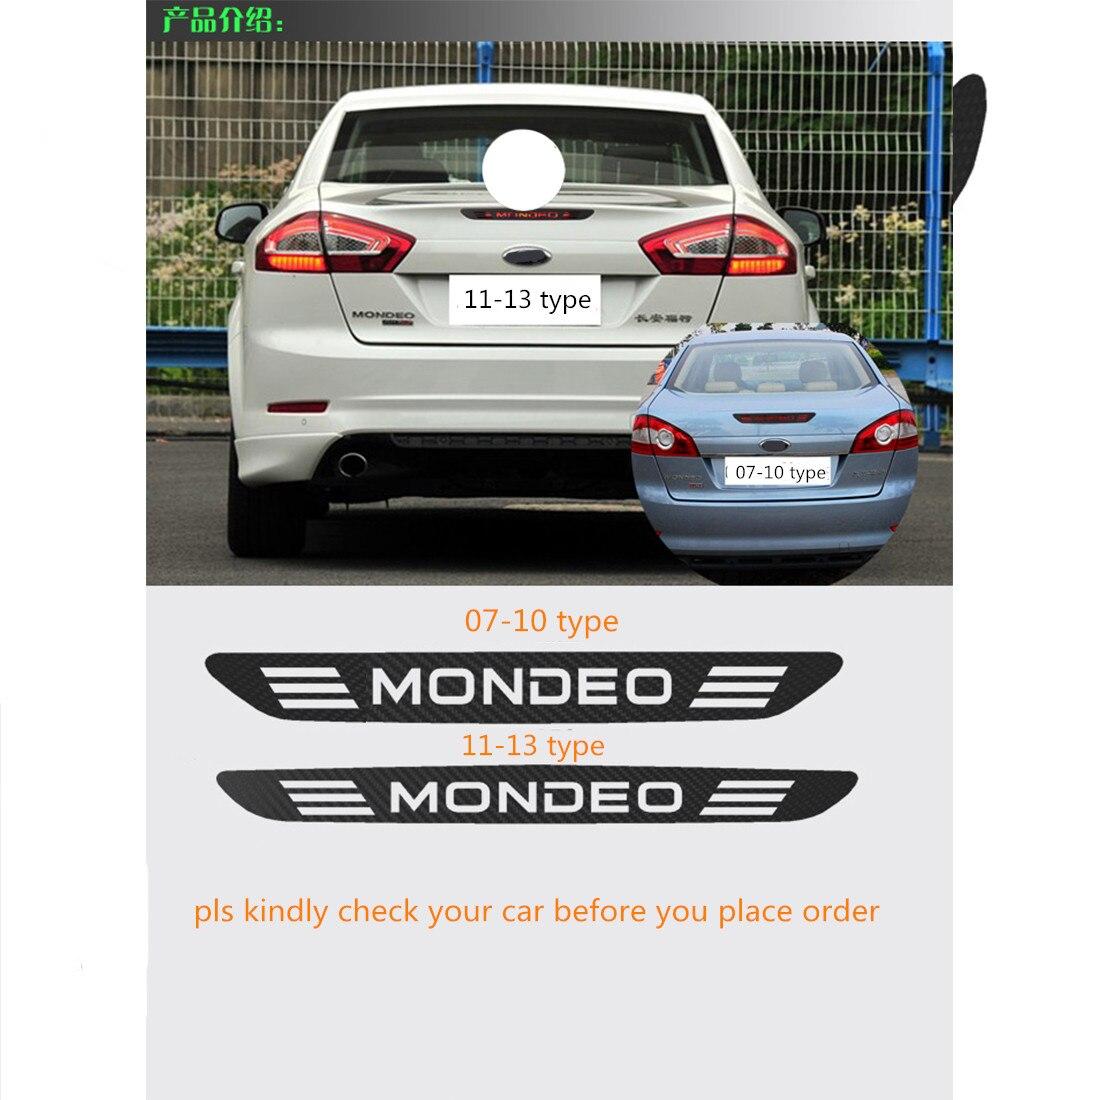 Car carbon sticker design - For Mondeo 07 10 Carbon Fiber Vinyl Rear Windshield Brake Light Decoration Sticker Brake Lights